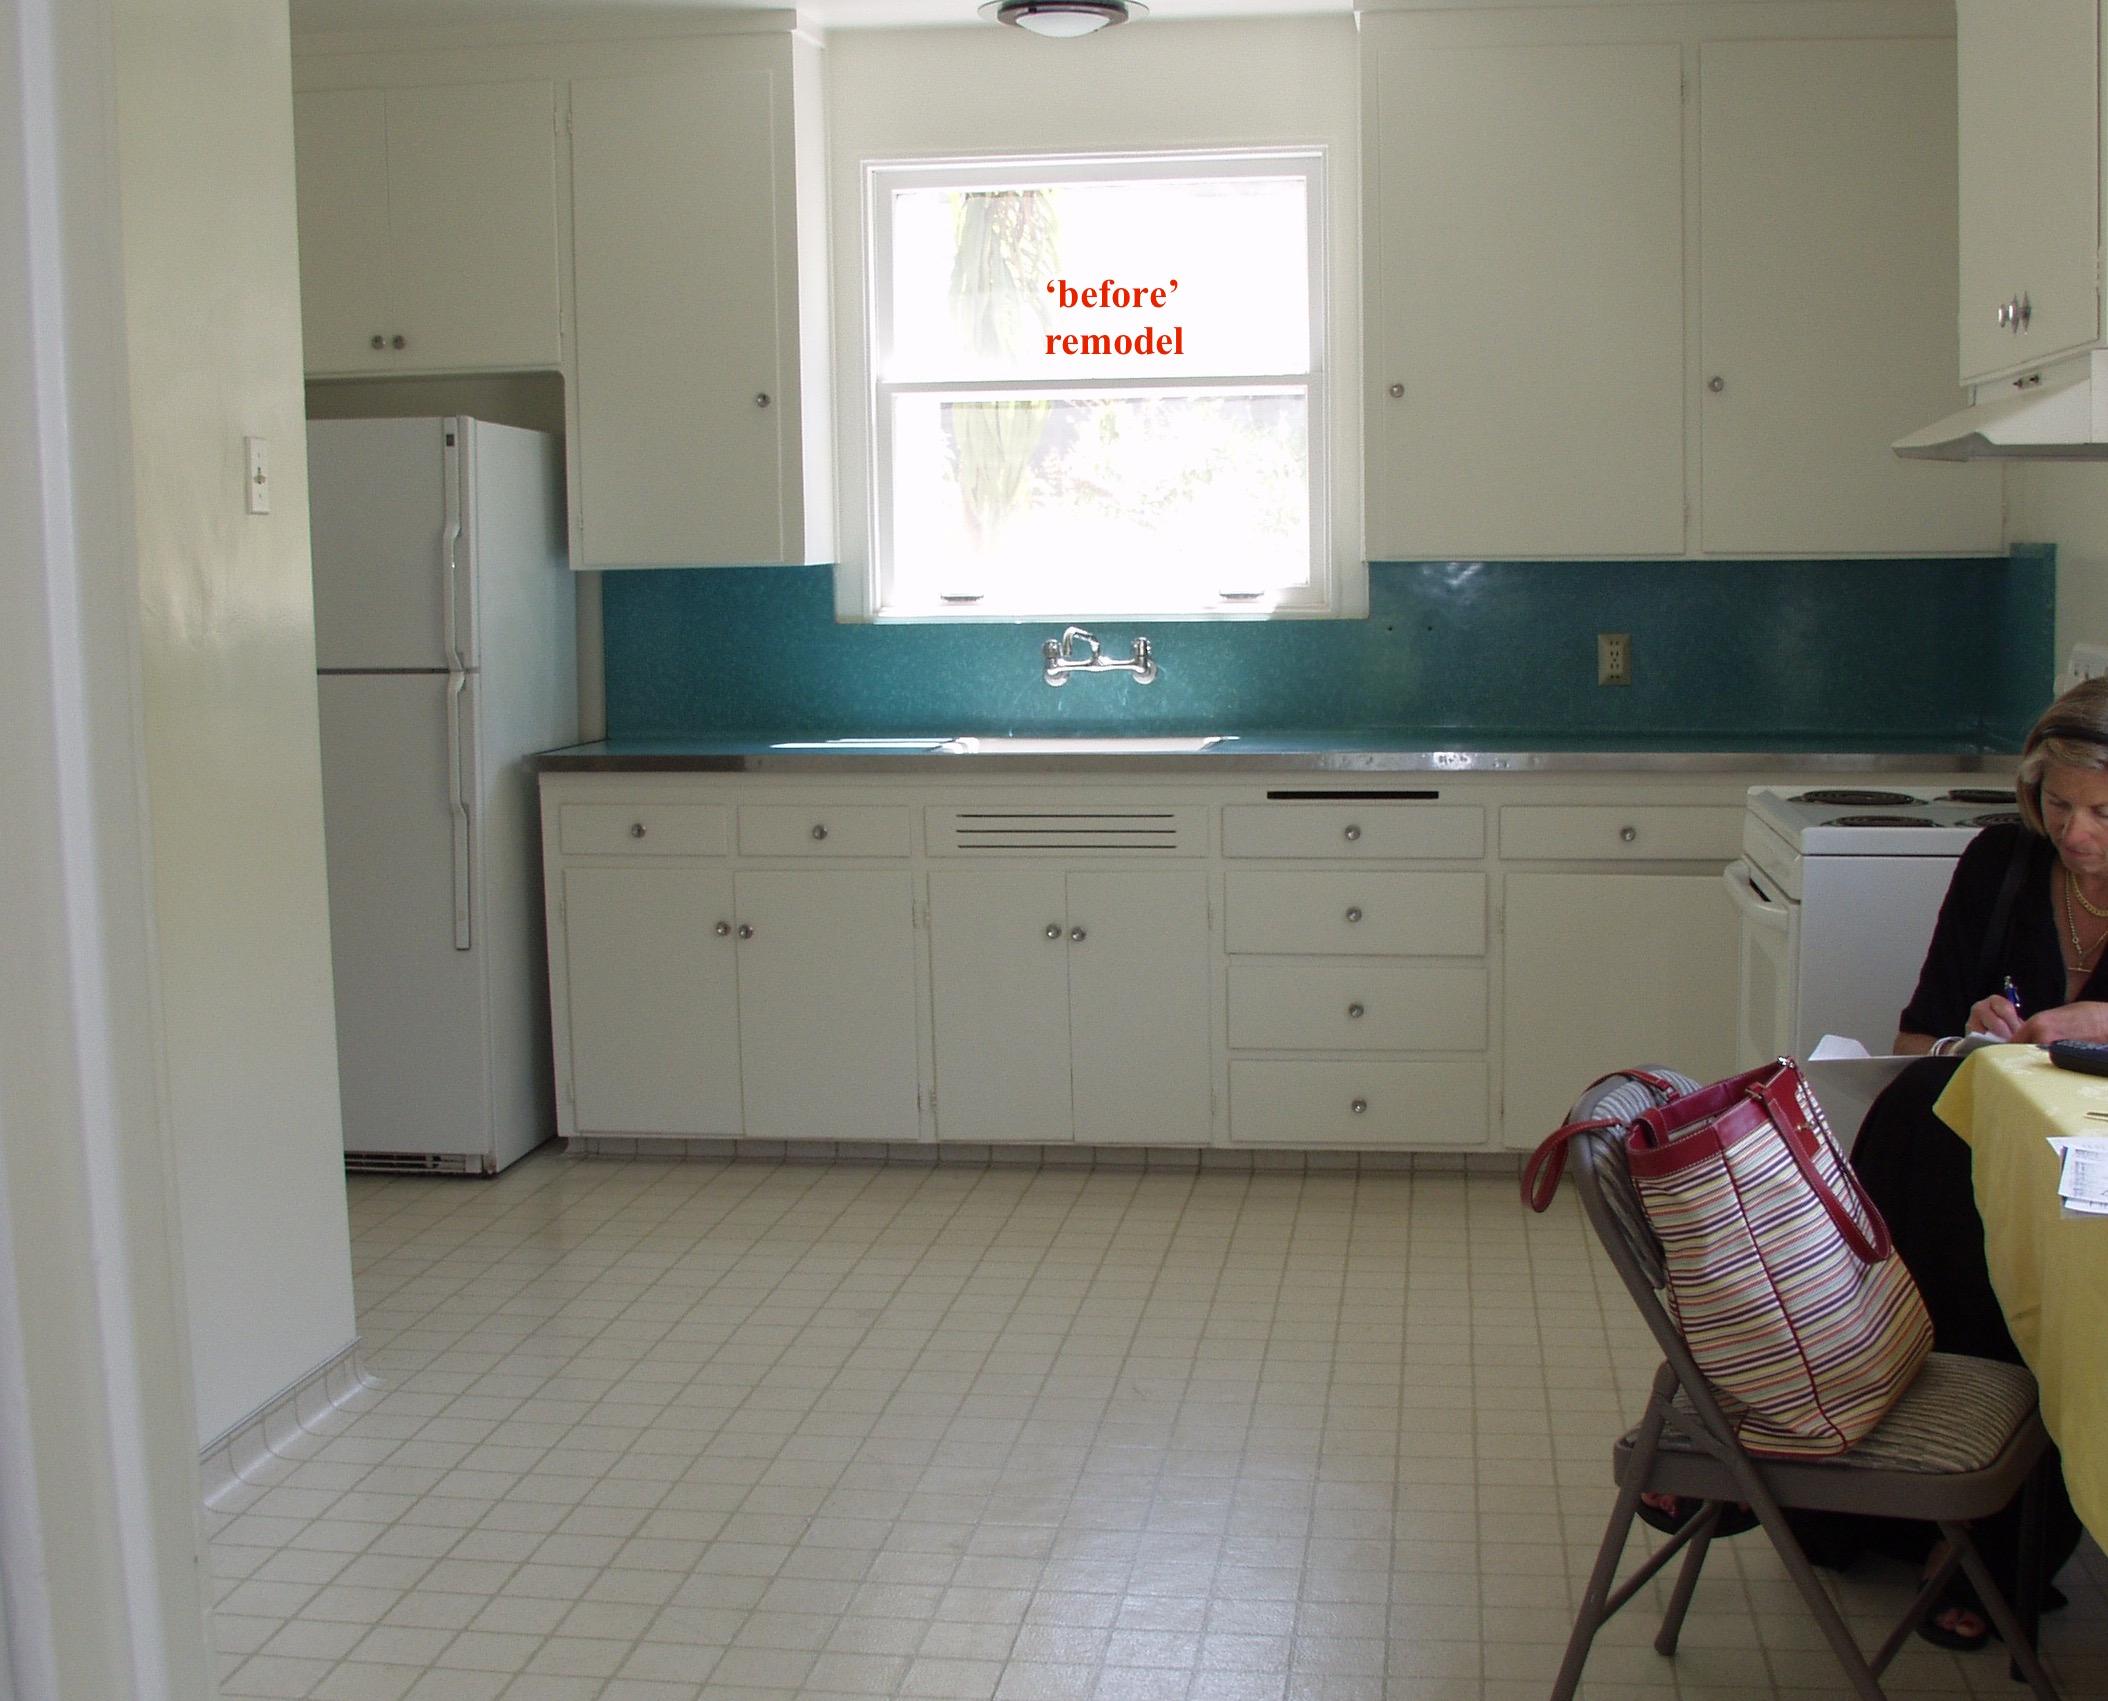 244 KIT 'before' pic  Kitchen.jpg